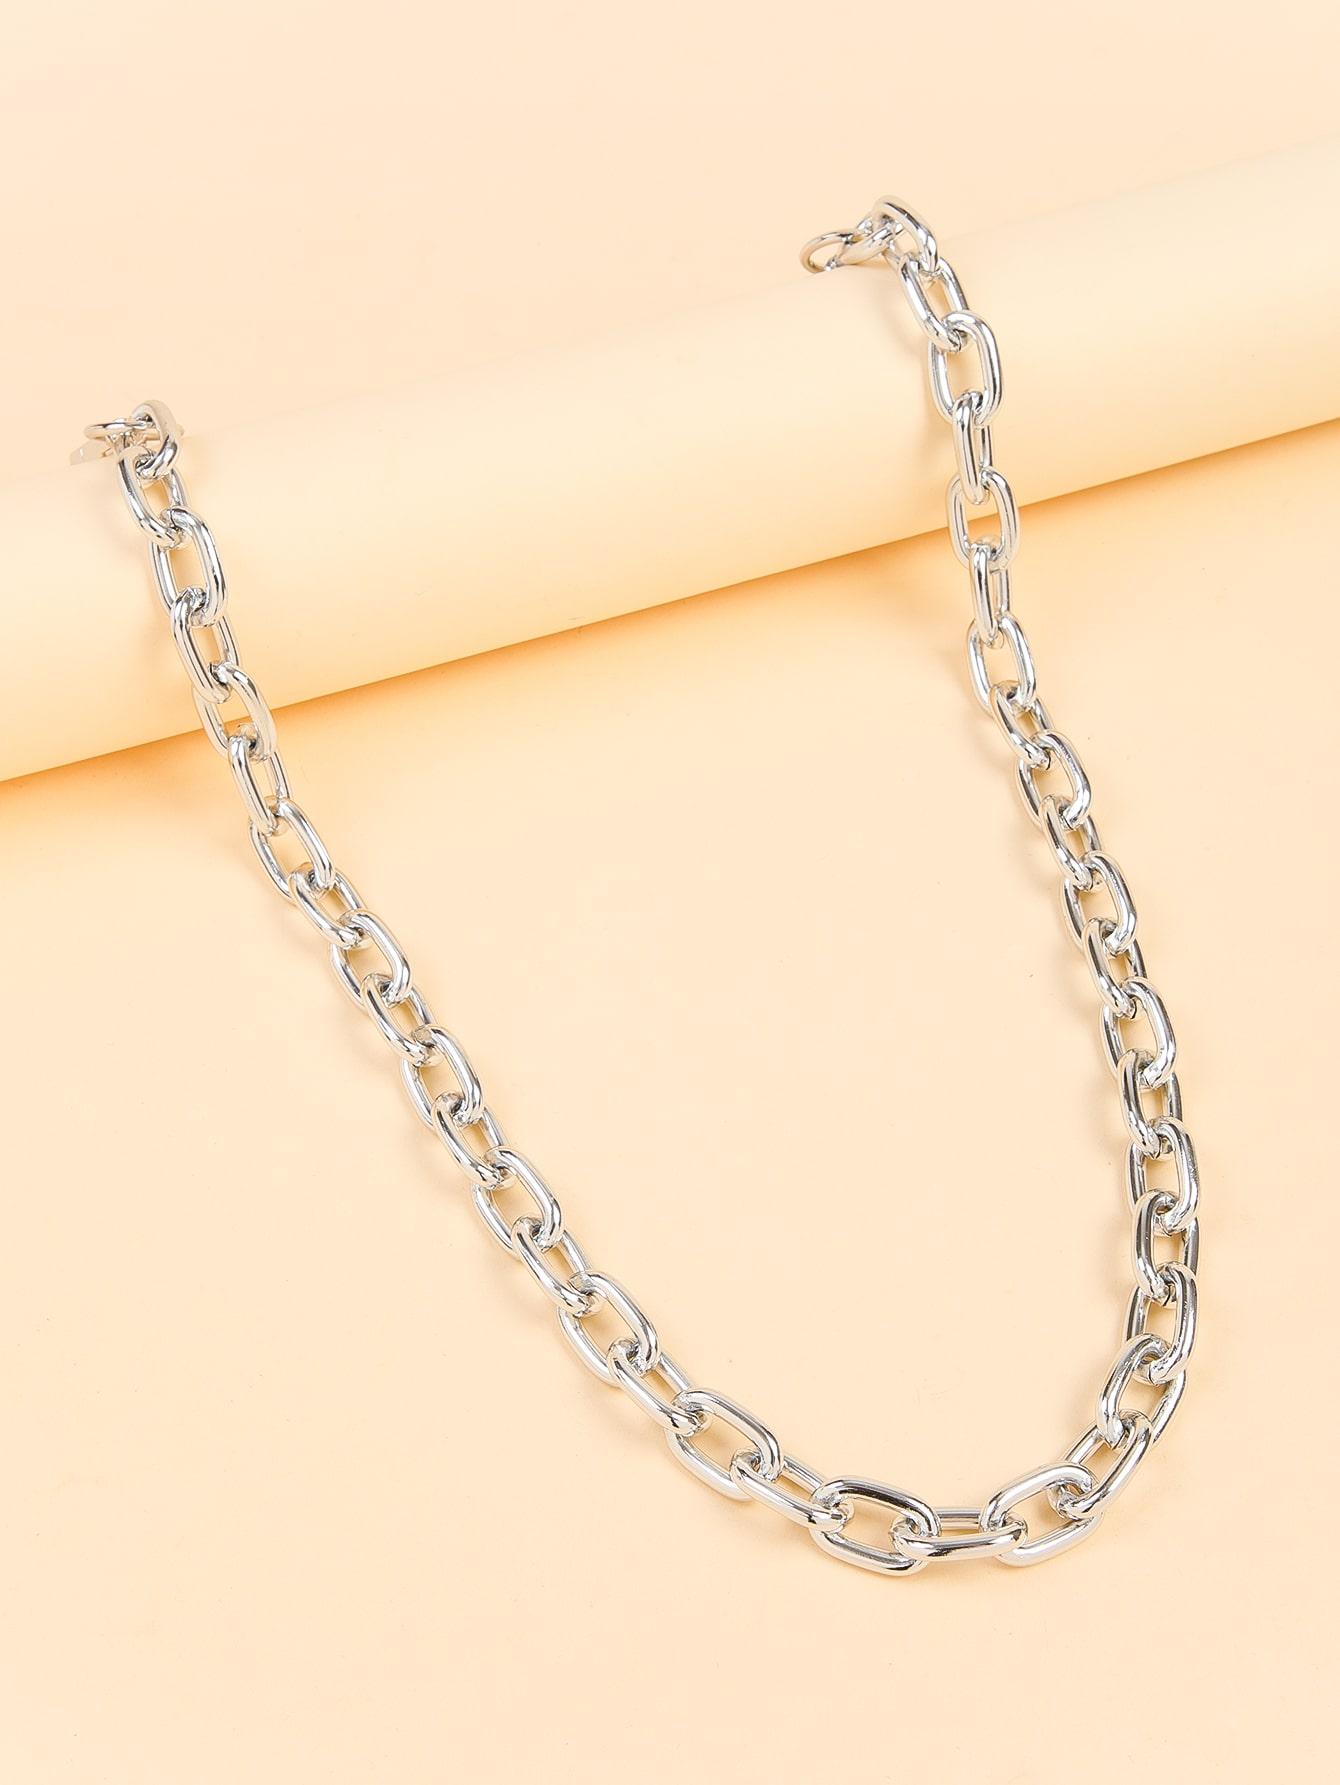 Minimalist Pant Chain thumbnail